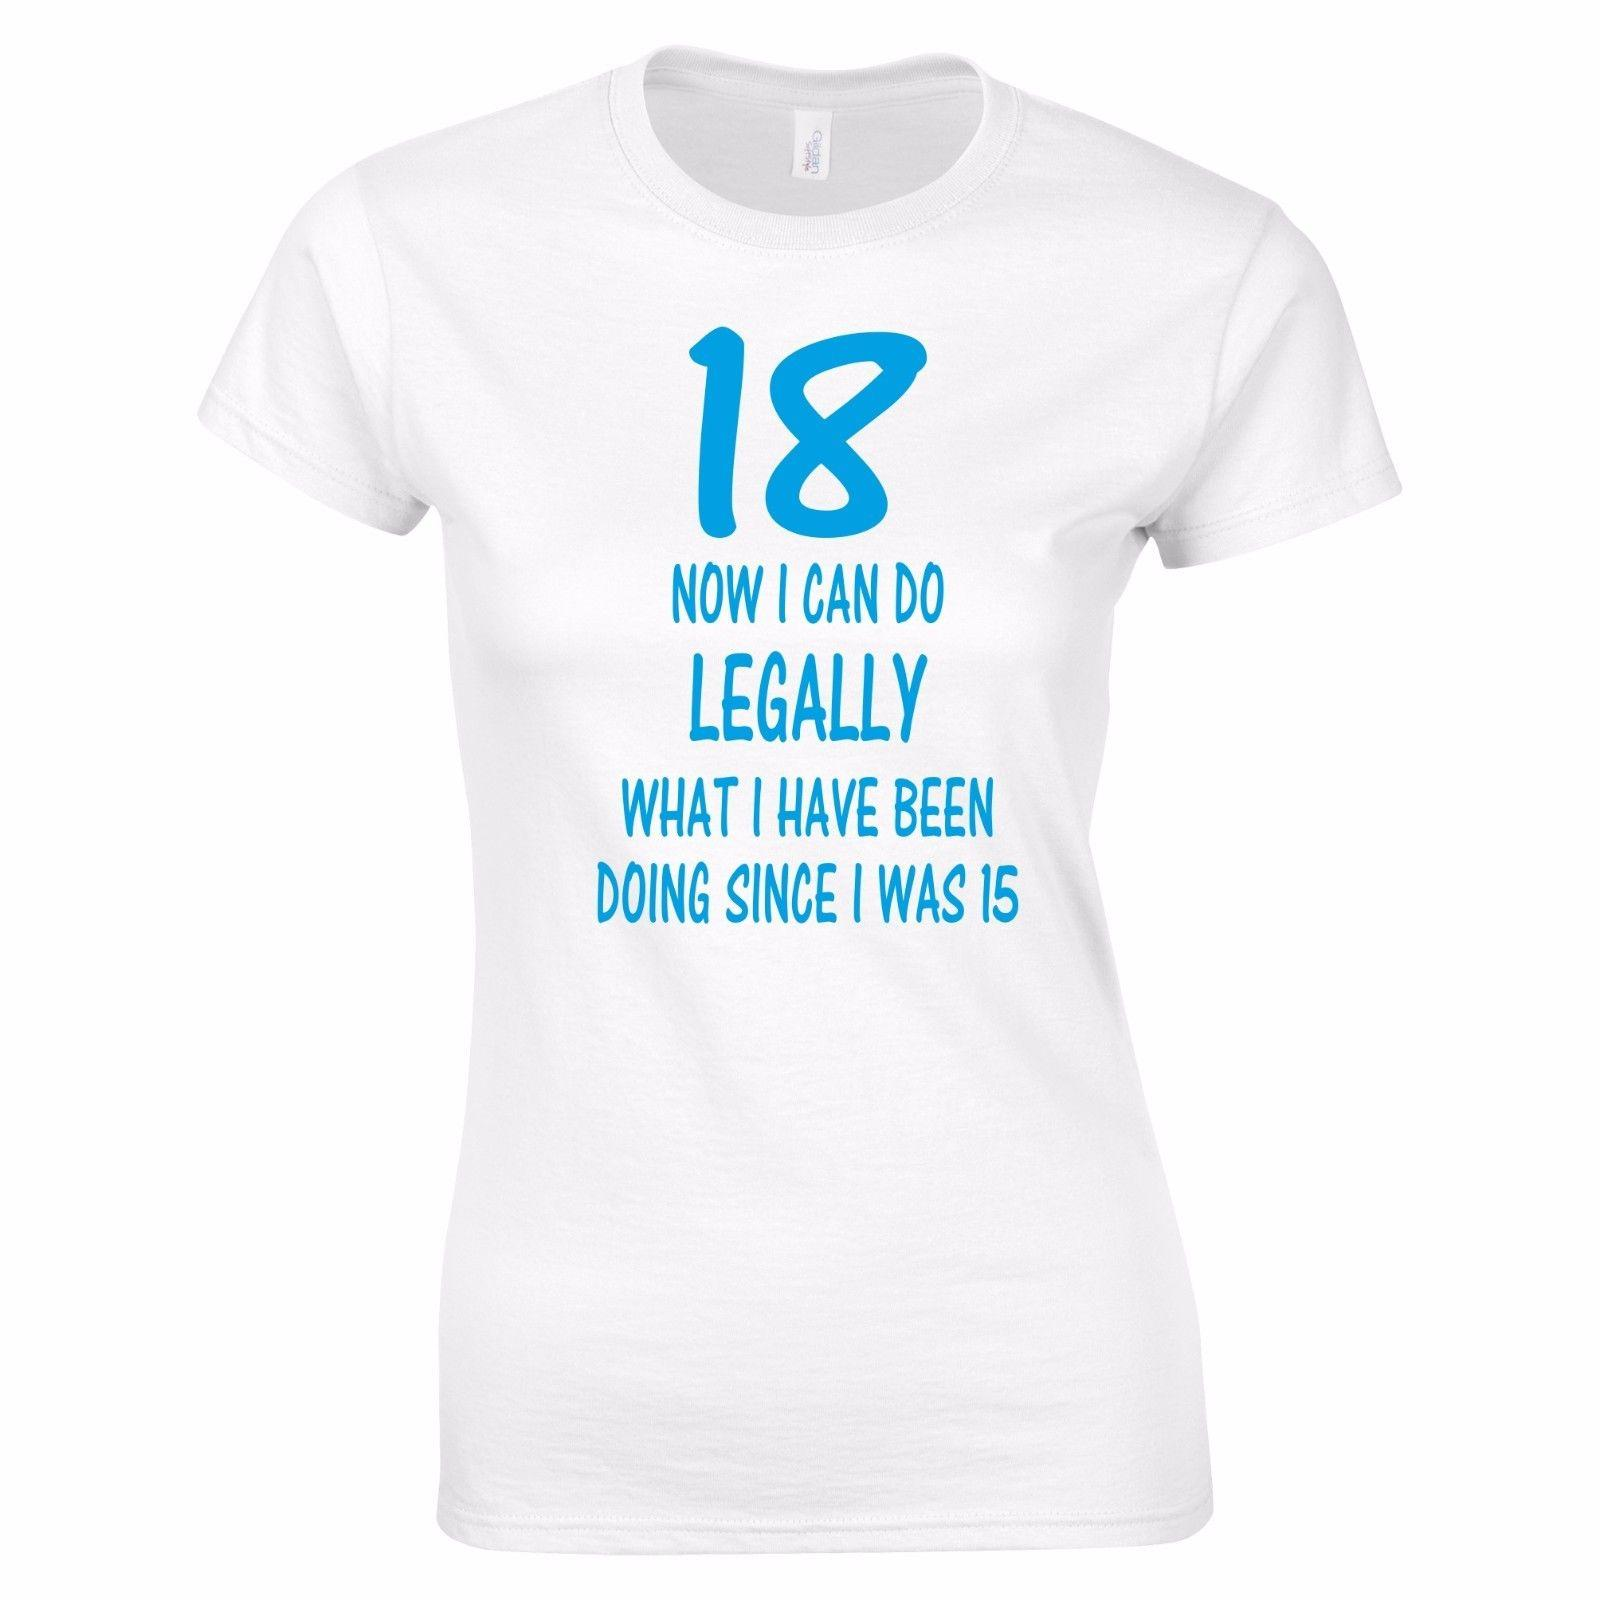 5e80309a 18 And Legal 18th Birthday Funny Tee T Shirt Top Tumblr Gift Xmas Secret  Santa Funny Unisex Casual Tshirt Tee Shirt Designs Humorous T Shirts From  ...